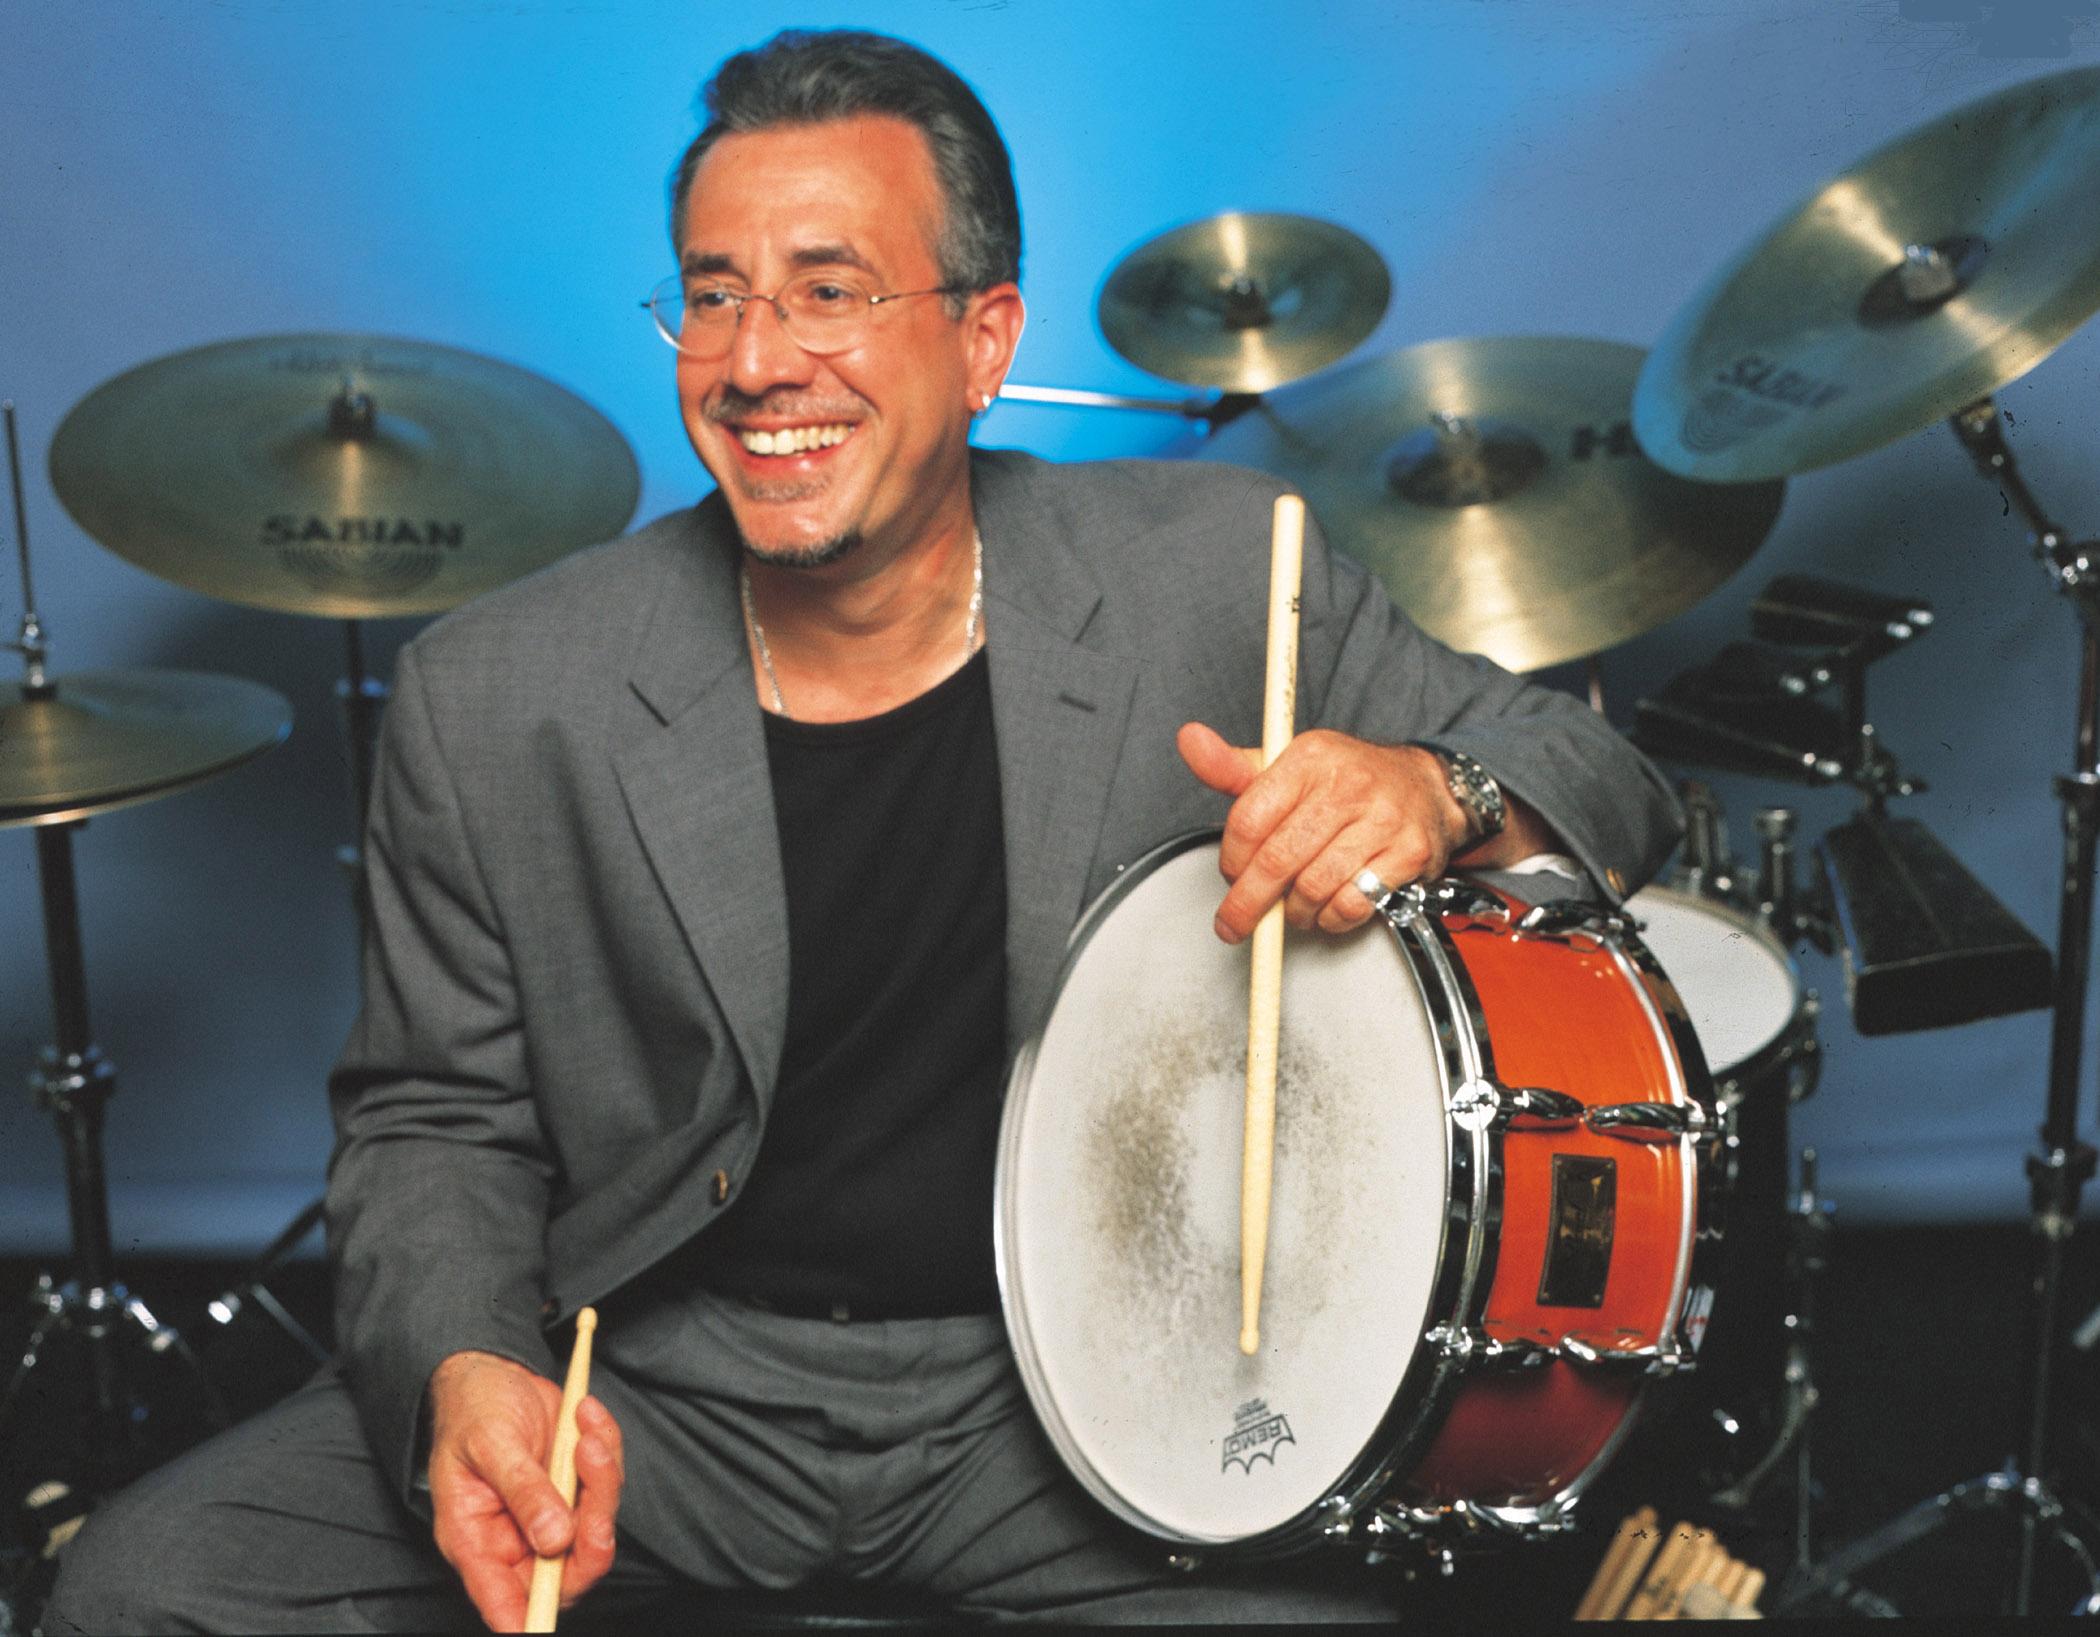 7x Grammy nominee, Bobby Sanabria